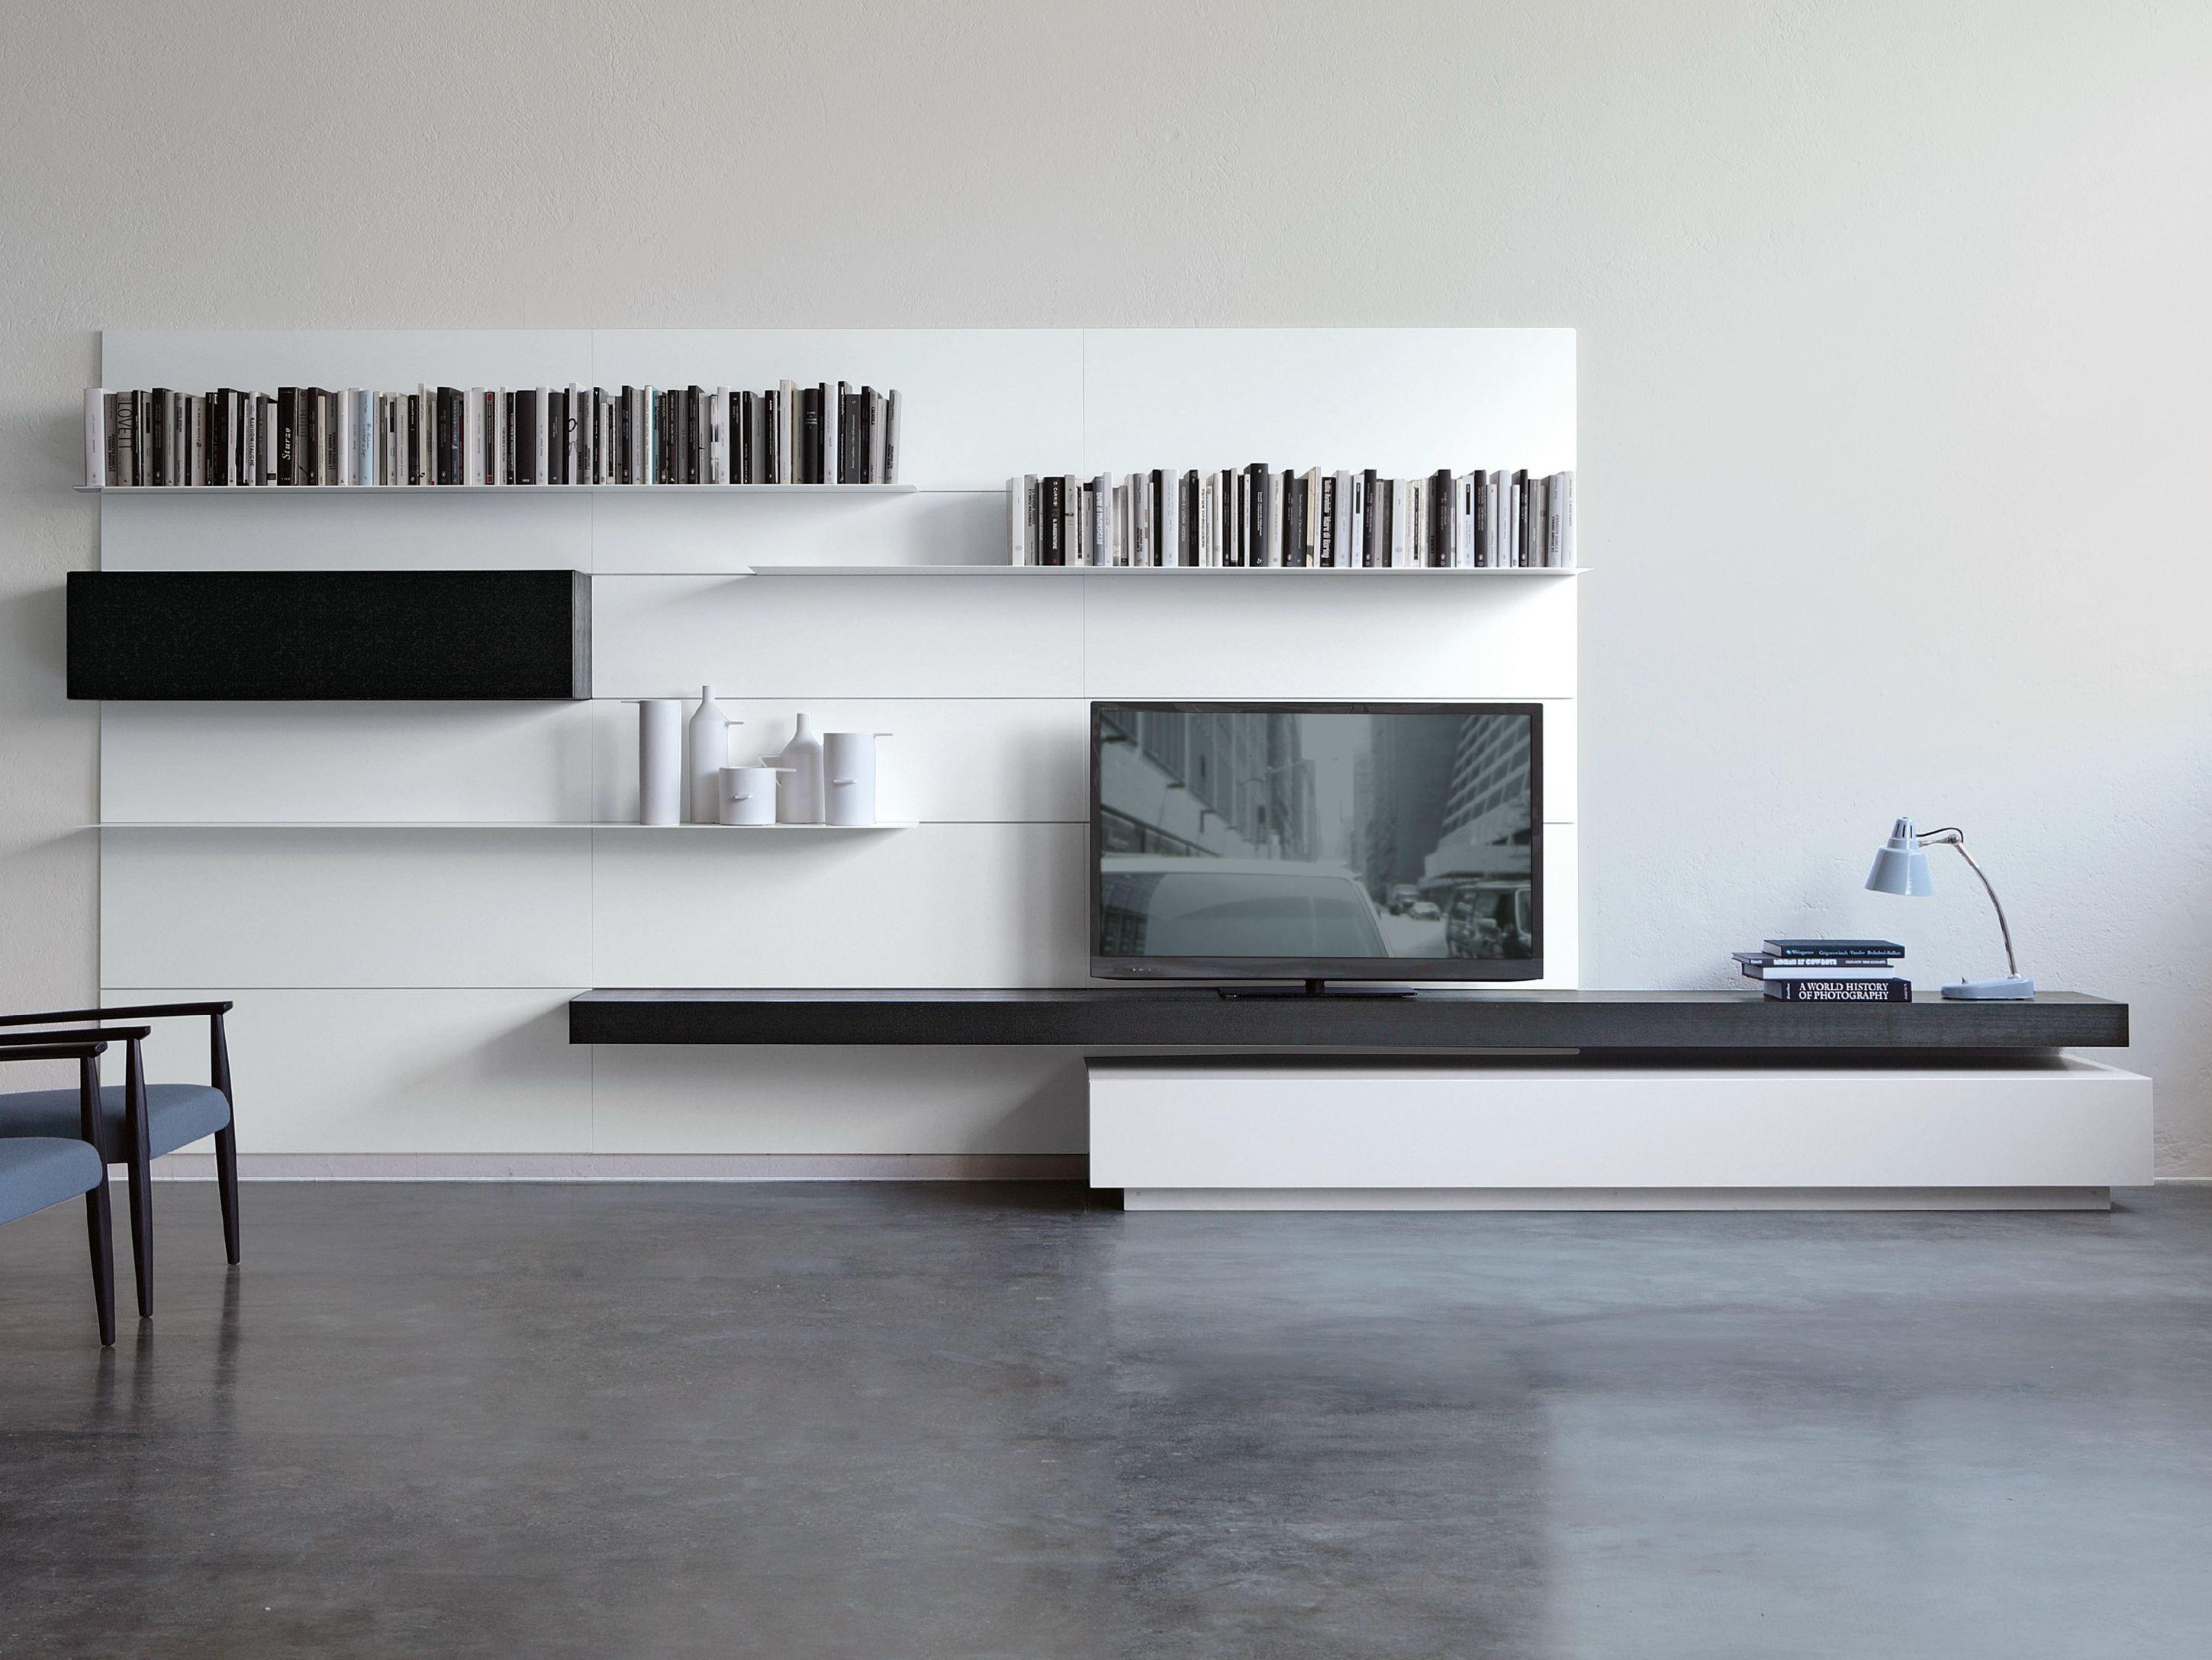 mueble modular de pared montaje pared load it by porro diseo piero lissoni